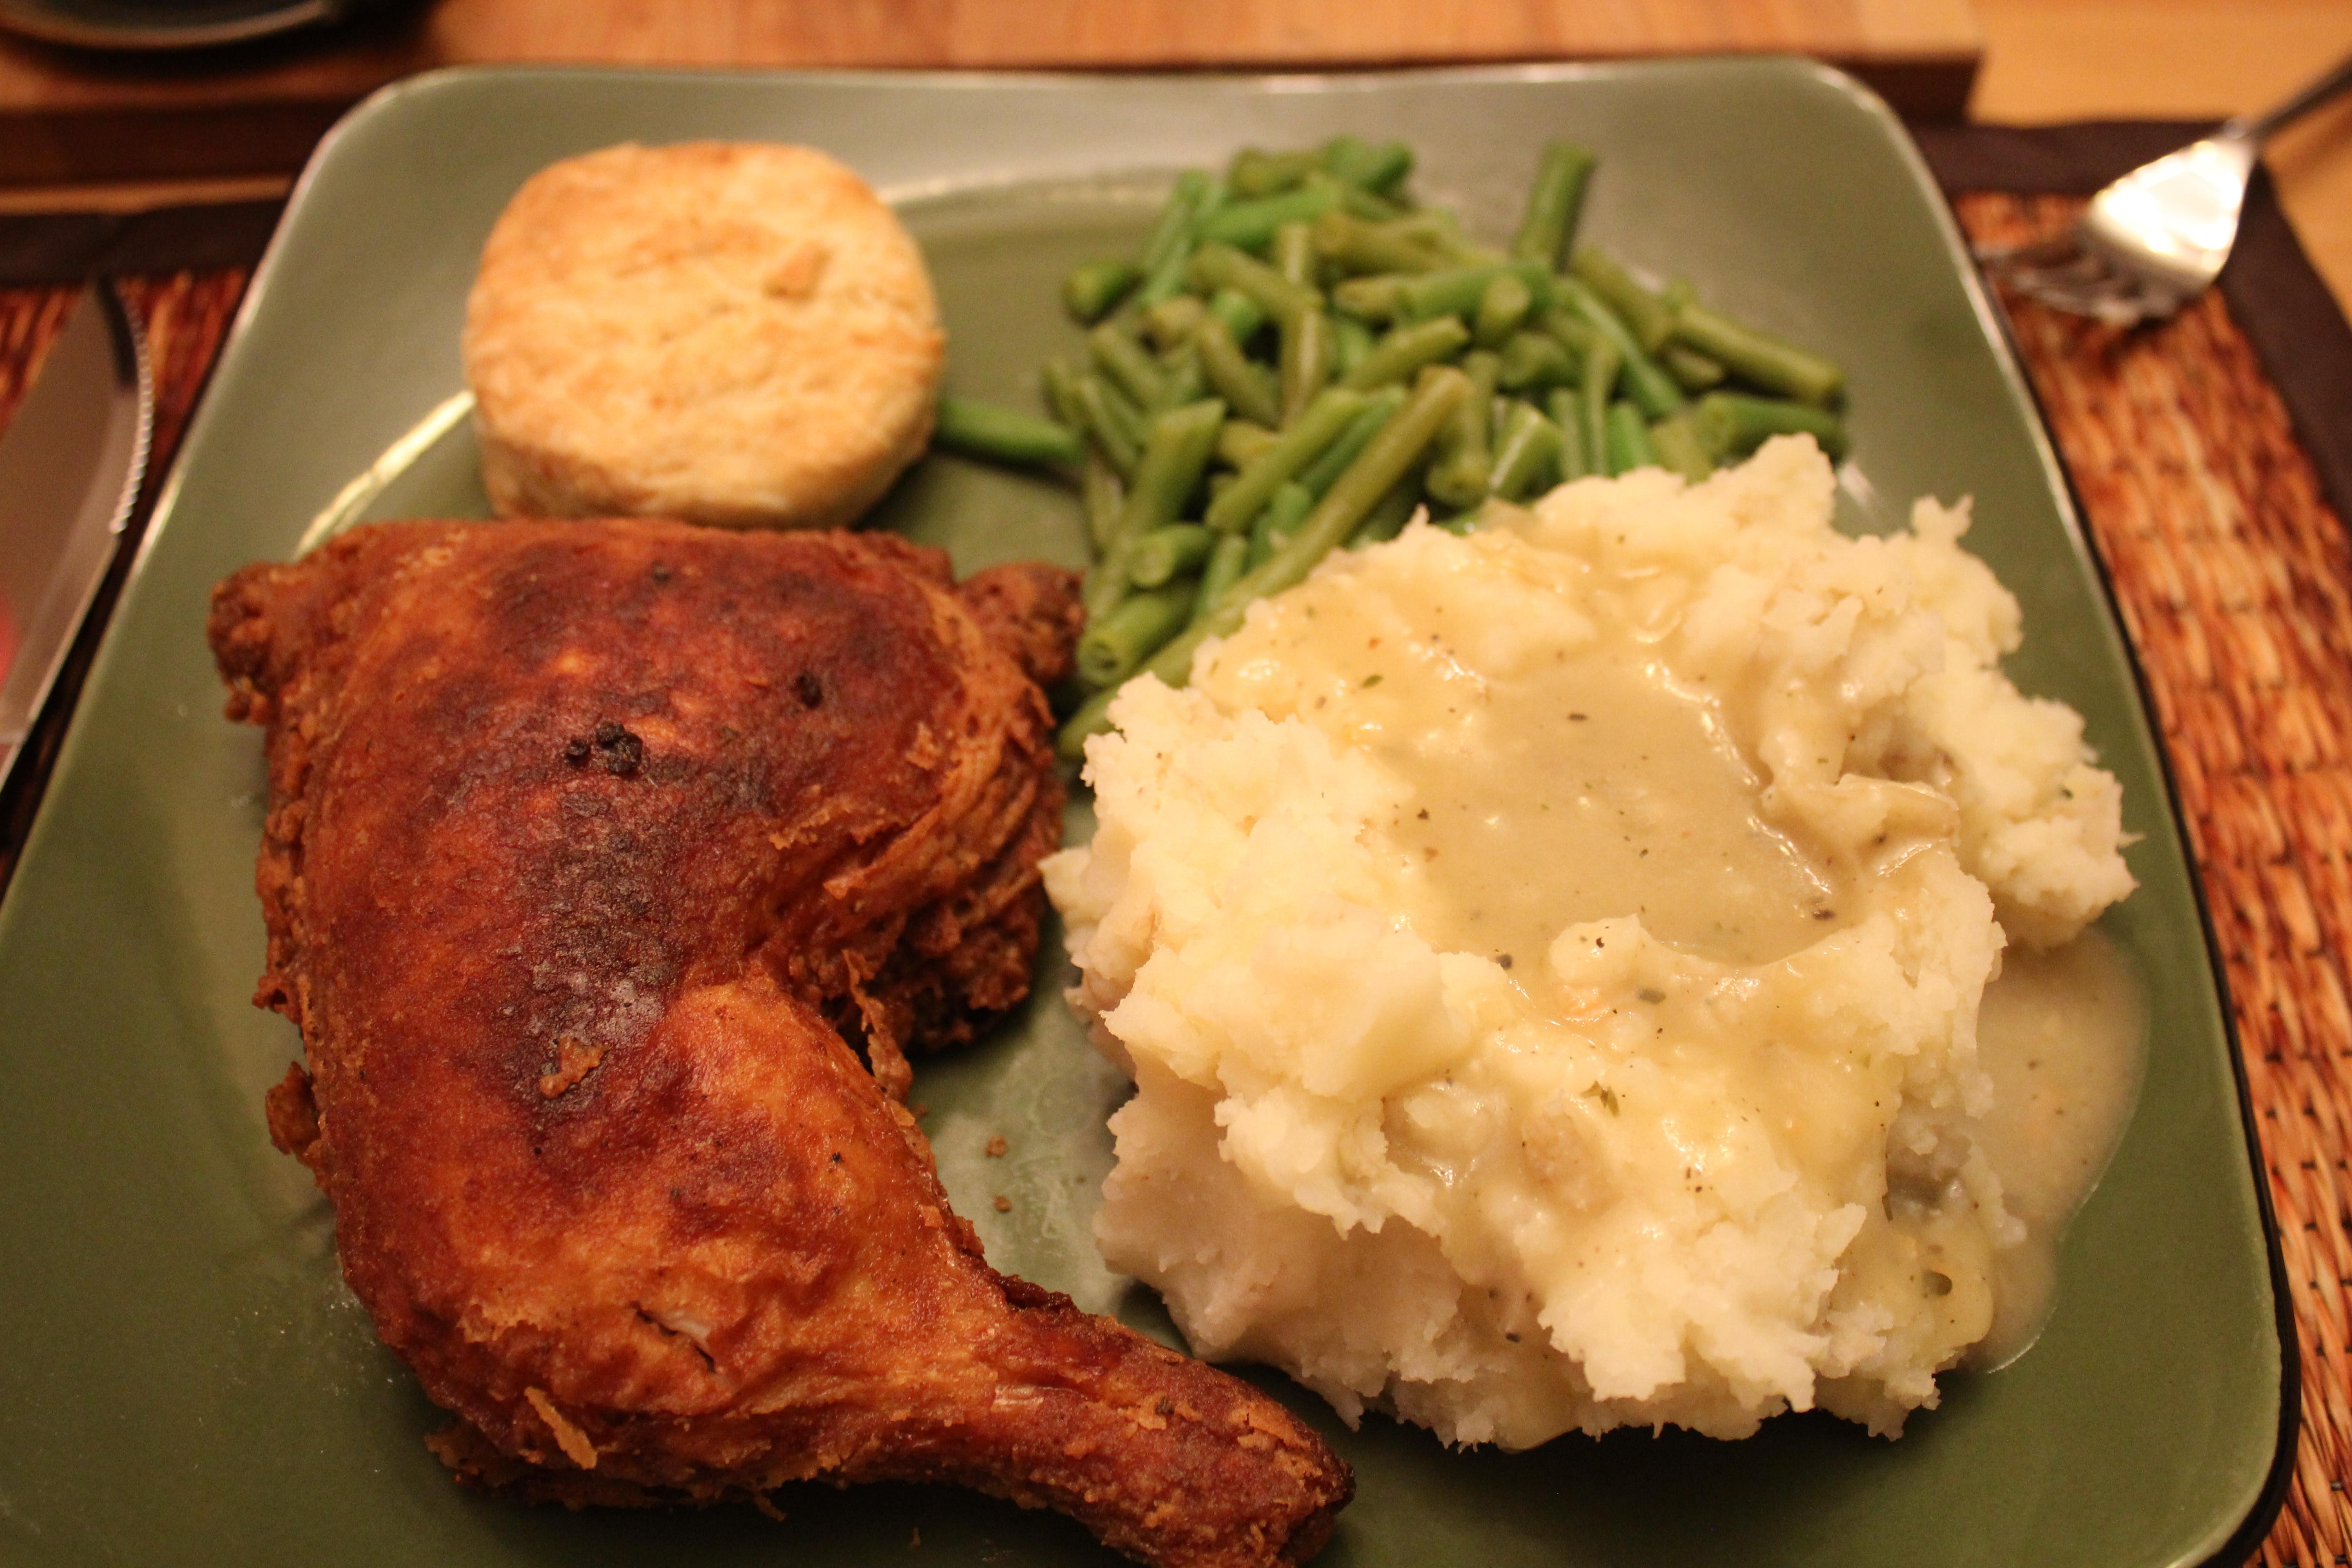 Fried Chicken Dinner  Deep South Part 4 Natchez Mississippi and Fried Chicken